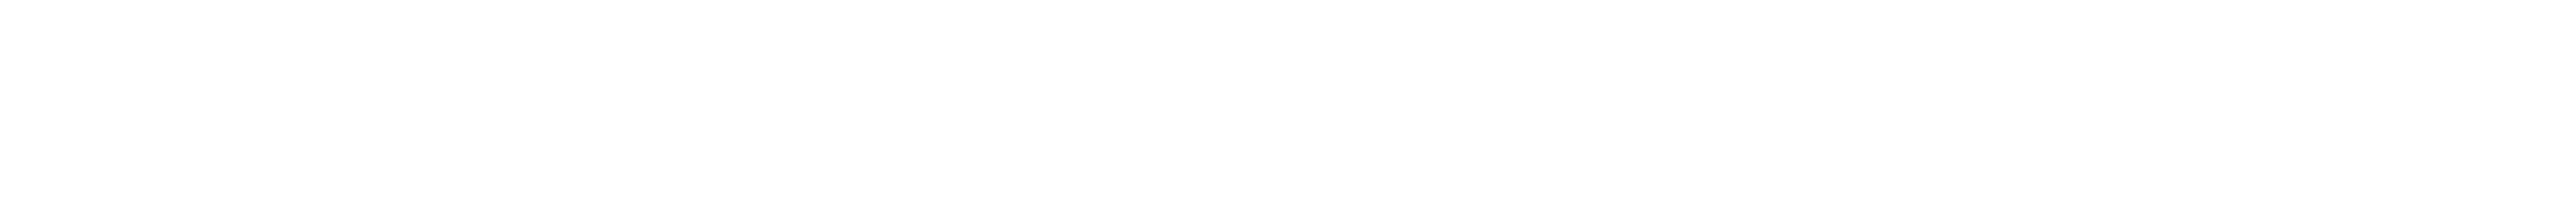 asseenin-logos2b